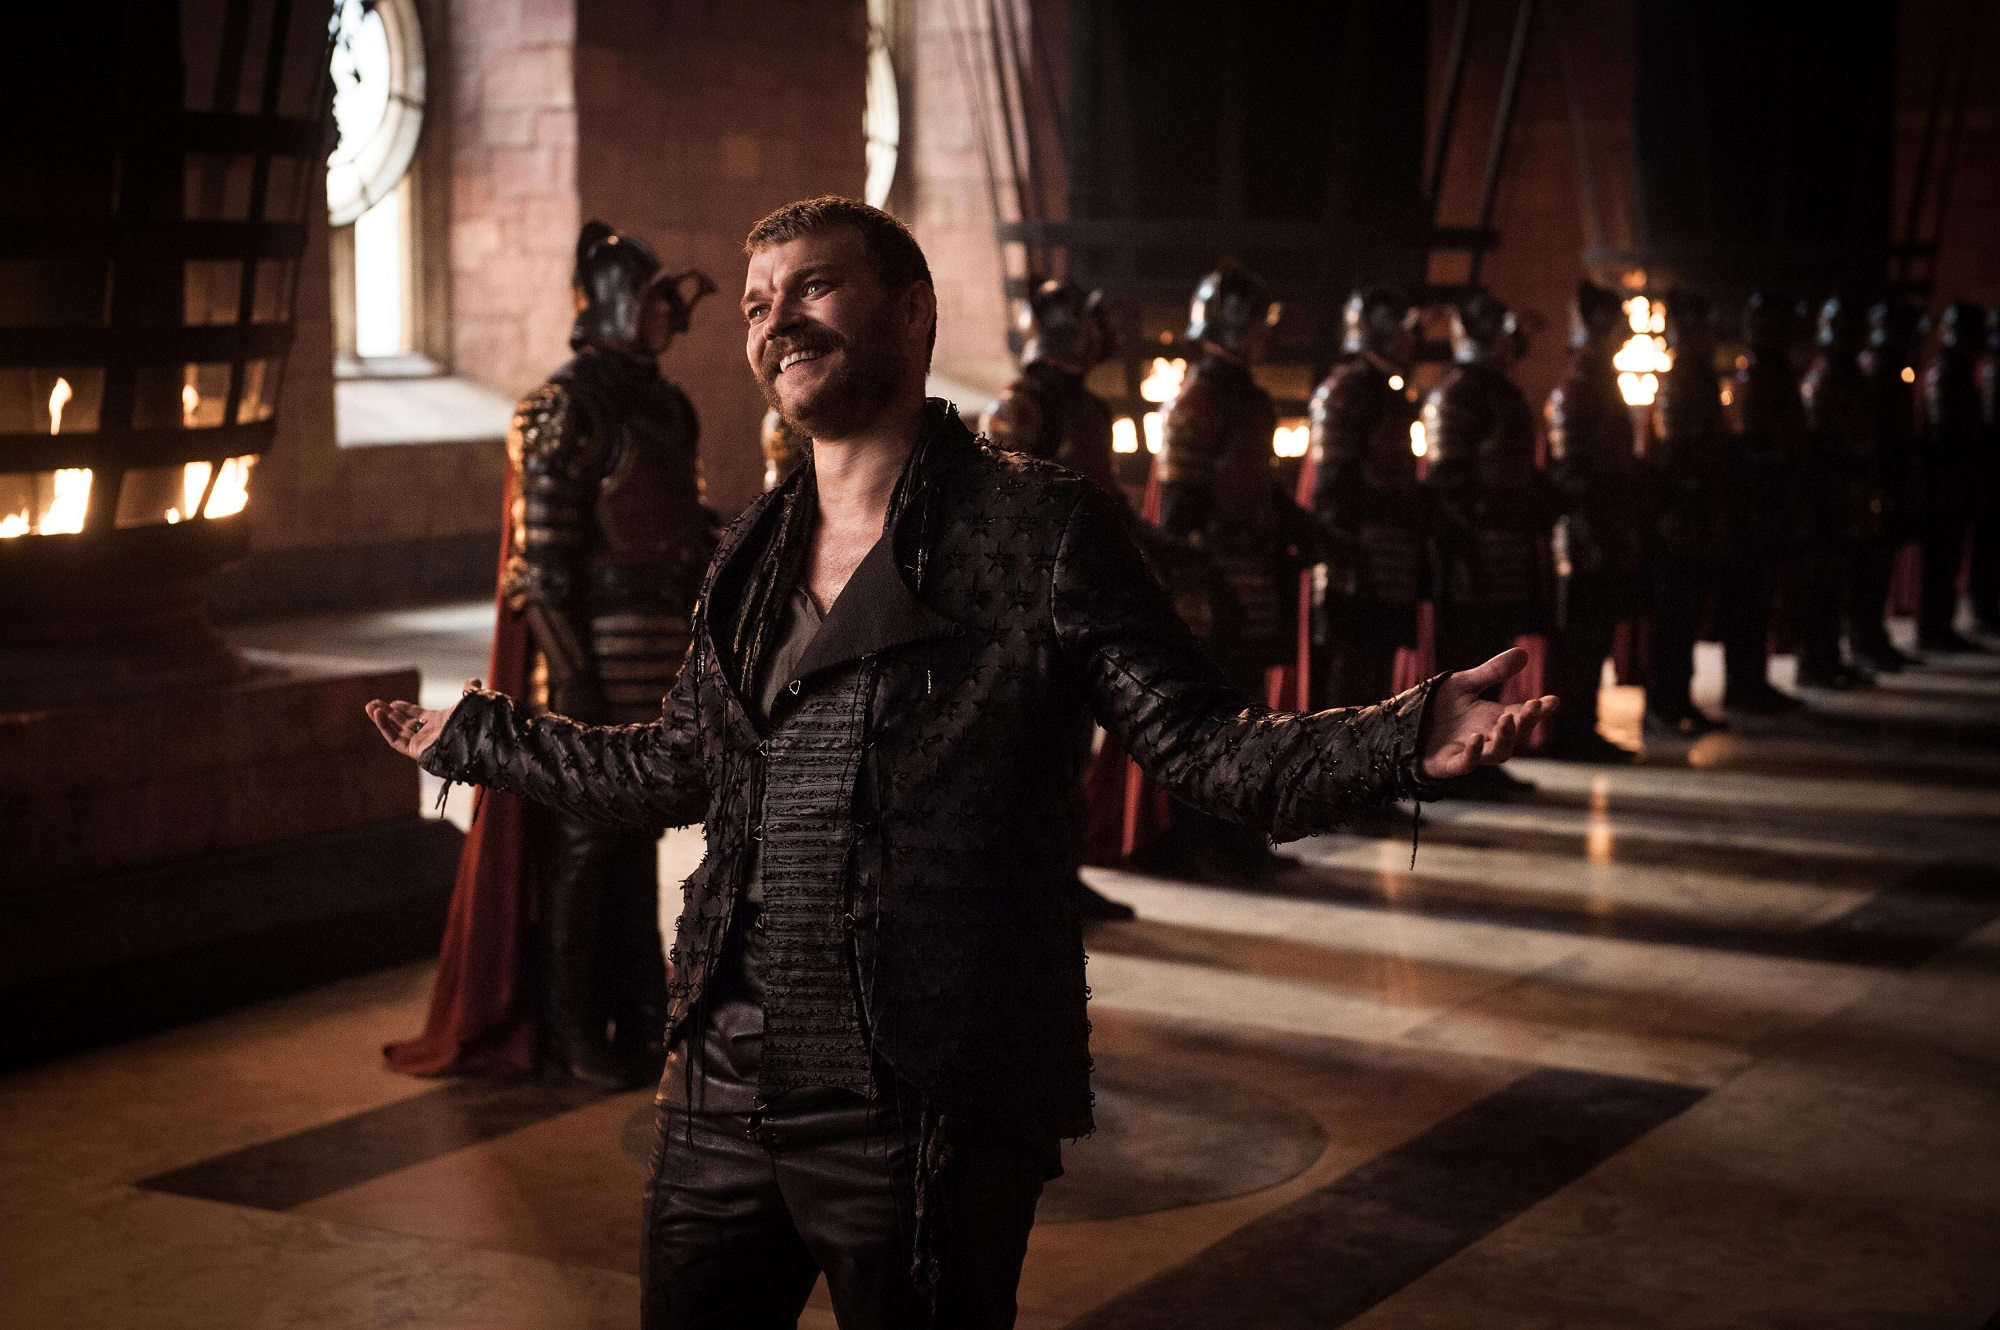 Game of Thrones Season 7 Episode 2 Recap: Jaime Holds Euron's Beer